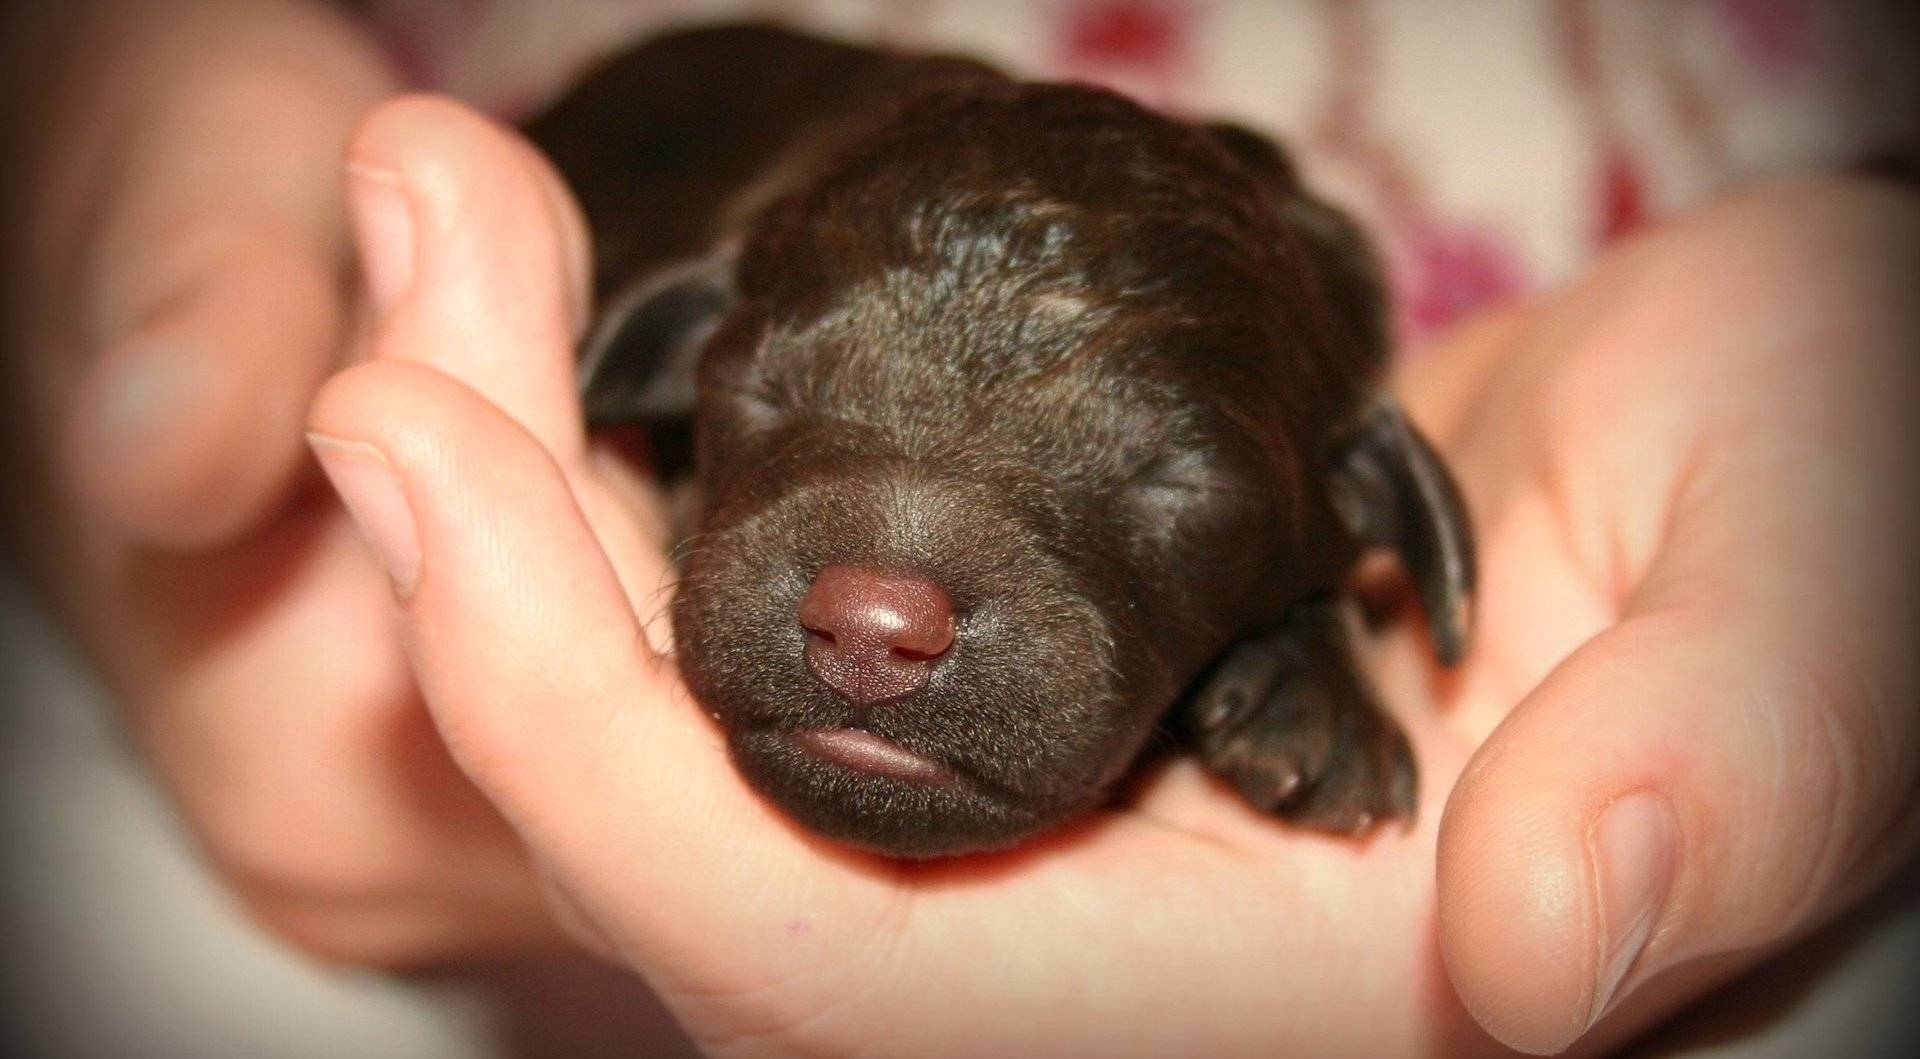 ᐉ когда щенки начинают хорошо видеть? - zoomanji.ru